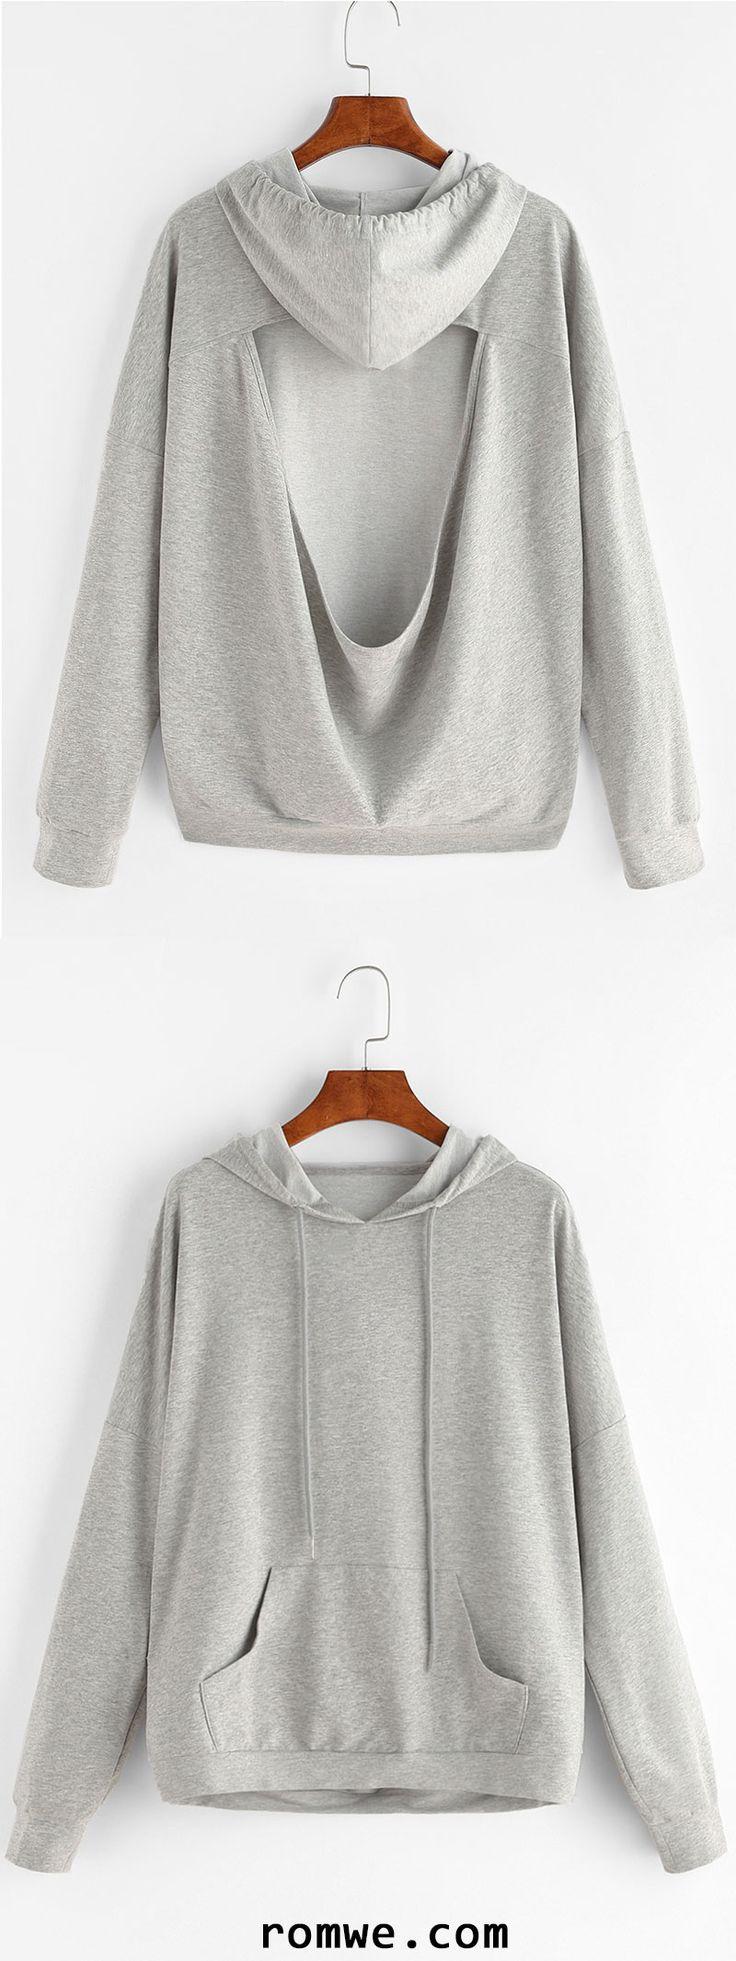 to wear - Wear you Trendswould a blanket coat video